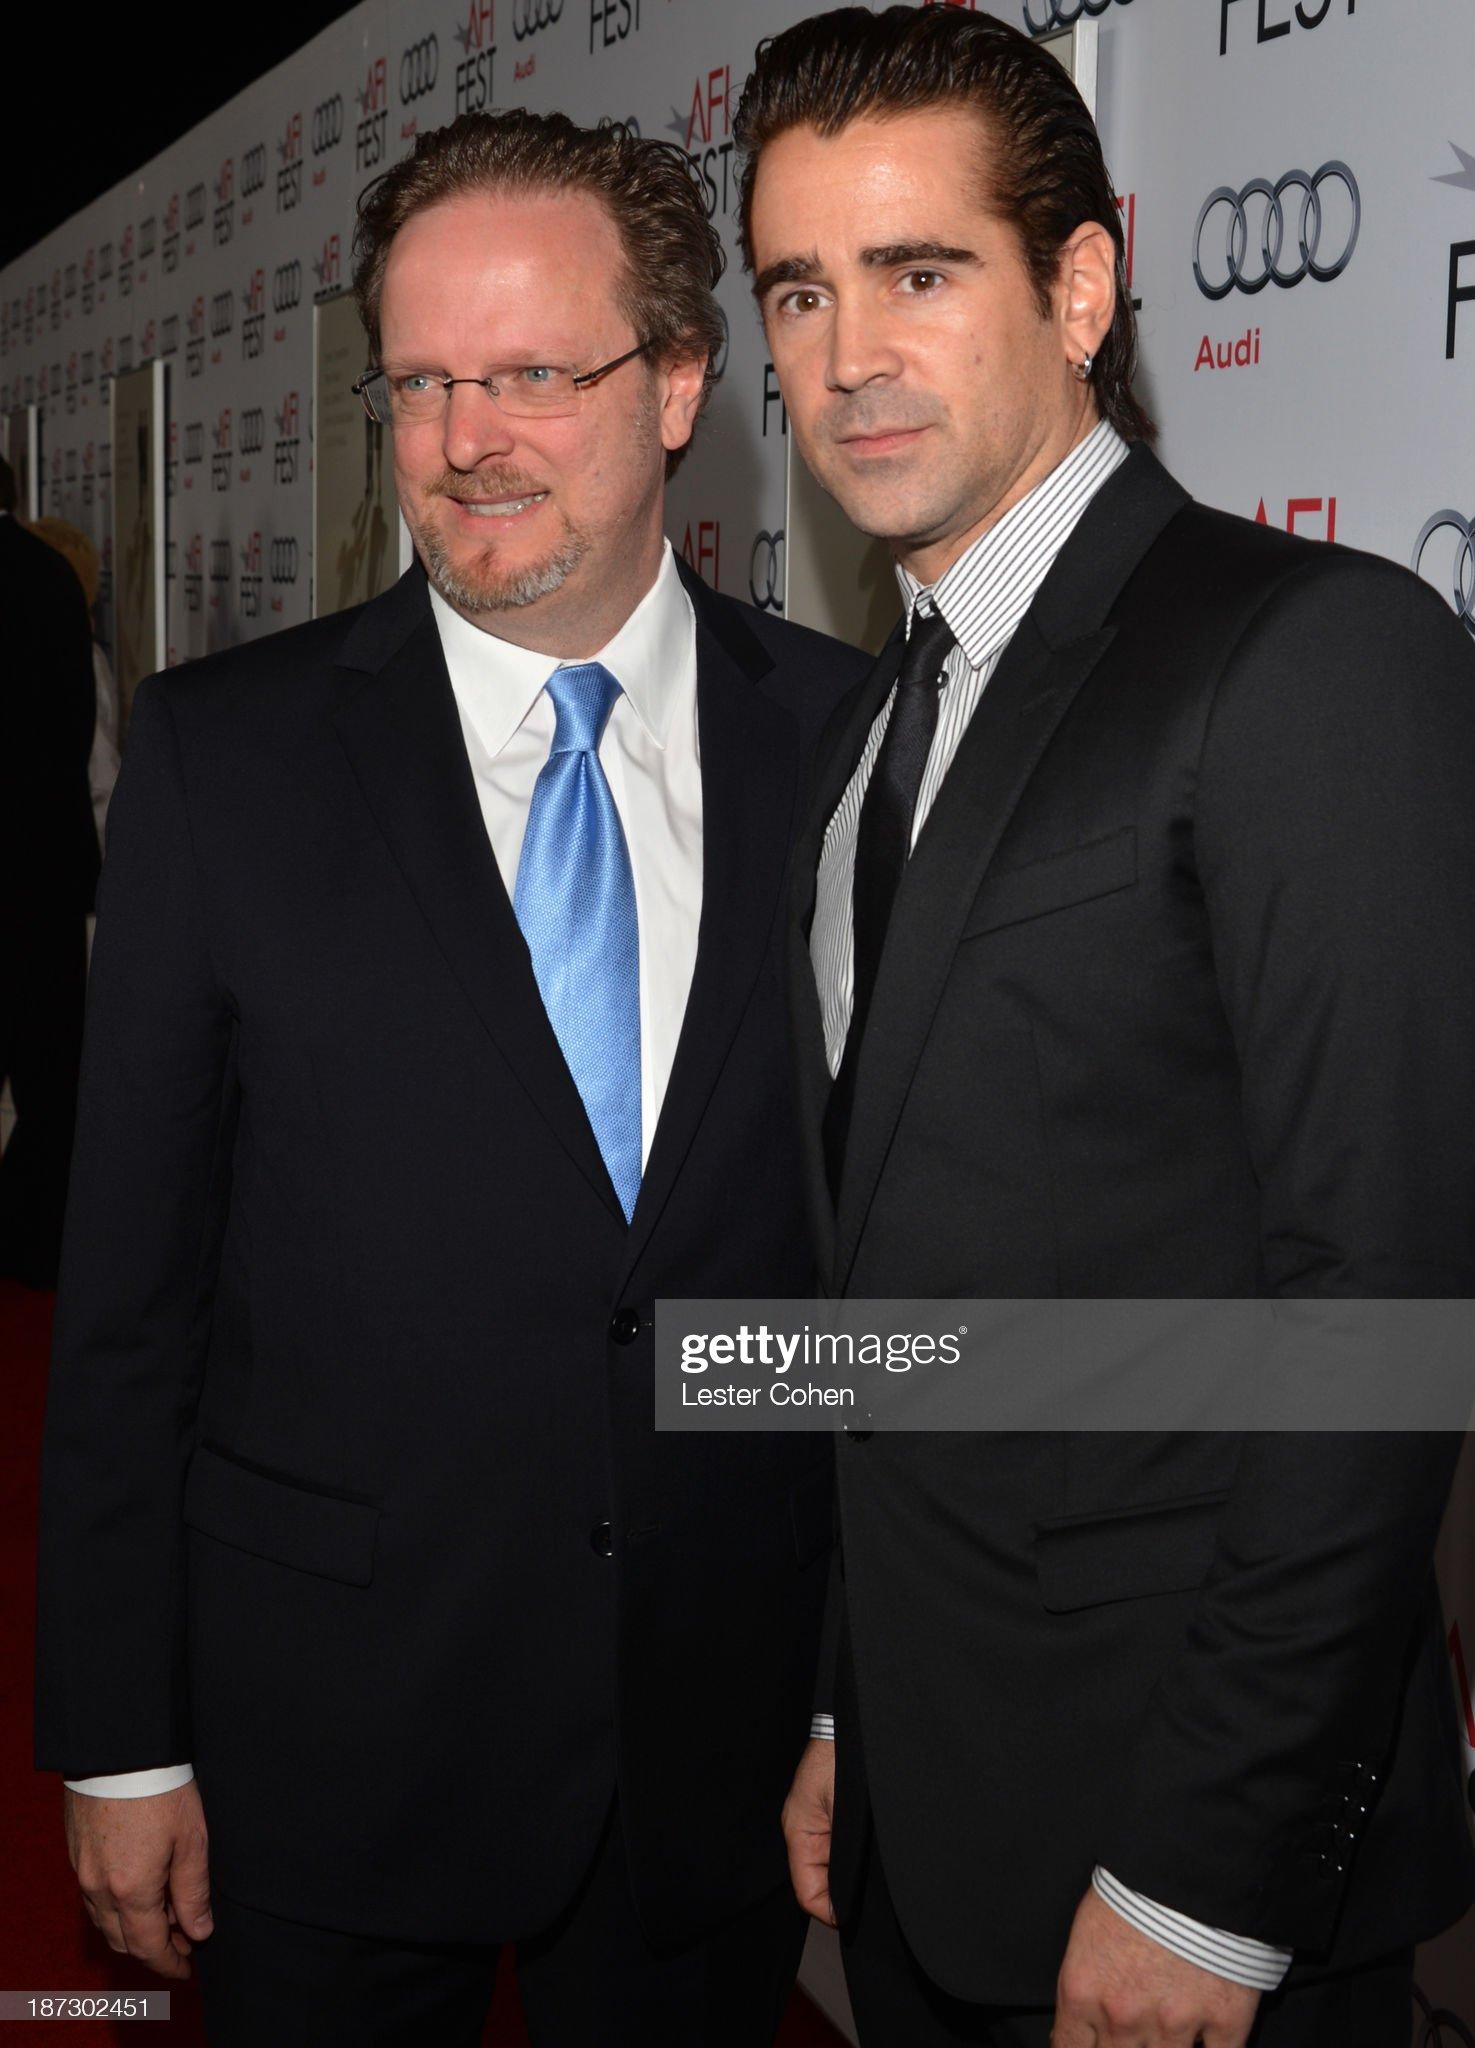 ¿Cuánto mide Colin Farrell? - Altura - Real height President-ceo-bob-gazzale-and-actor-colin-farrell-attend-the-premiere-picture-id187302451?s=2048x2048